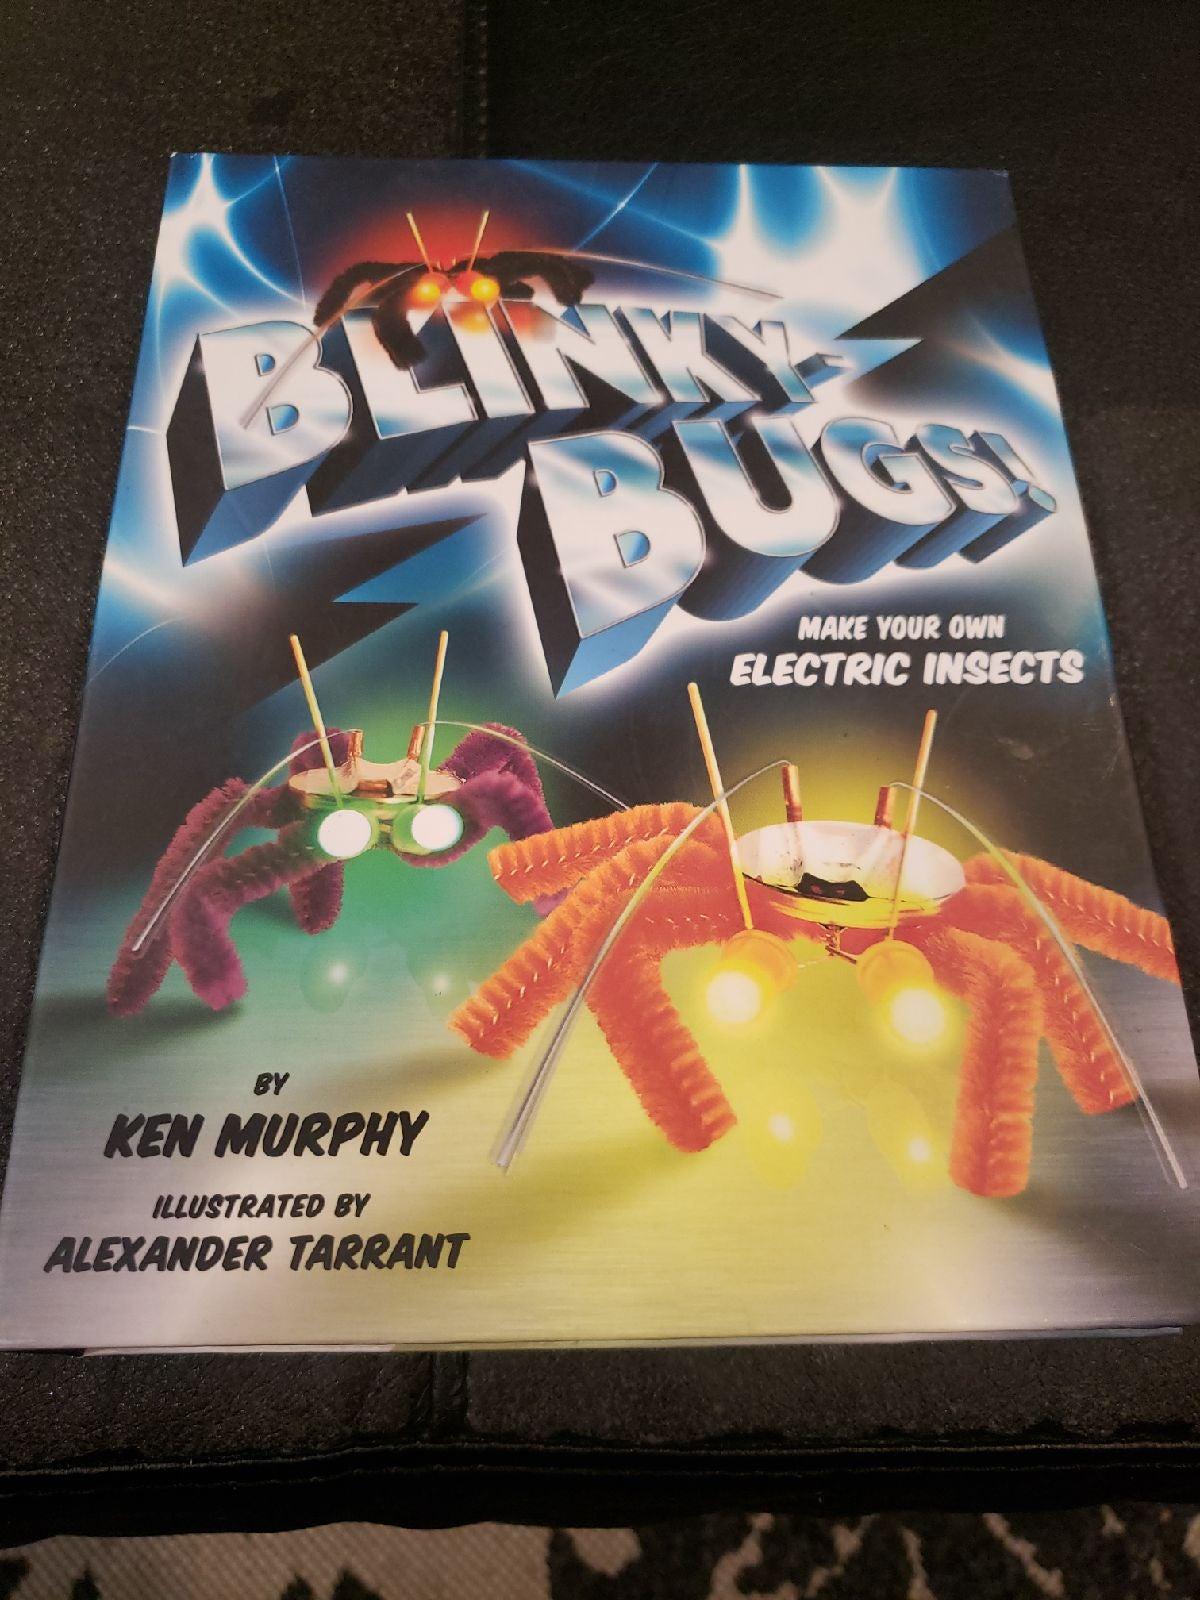 Blinky bugs!